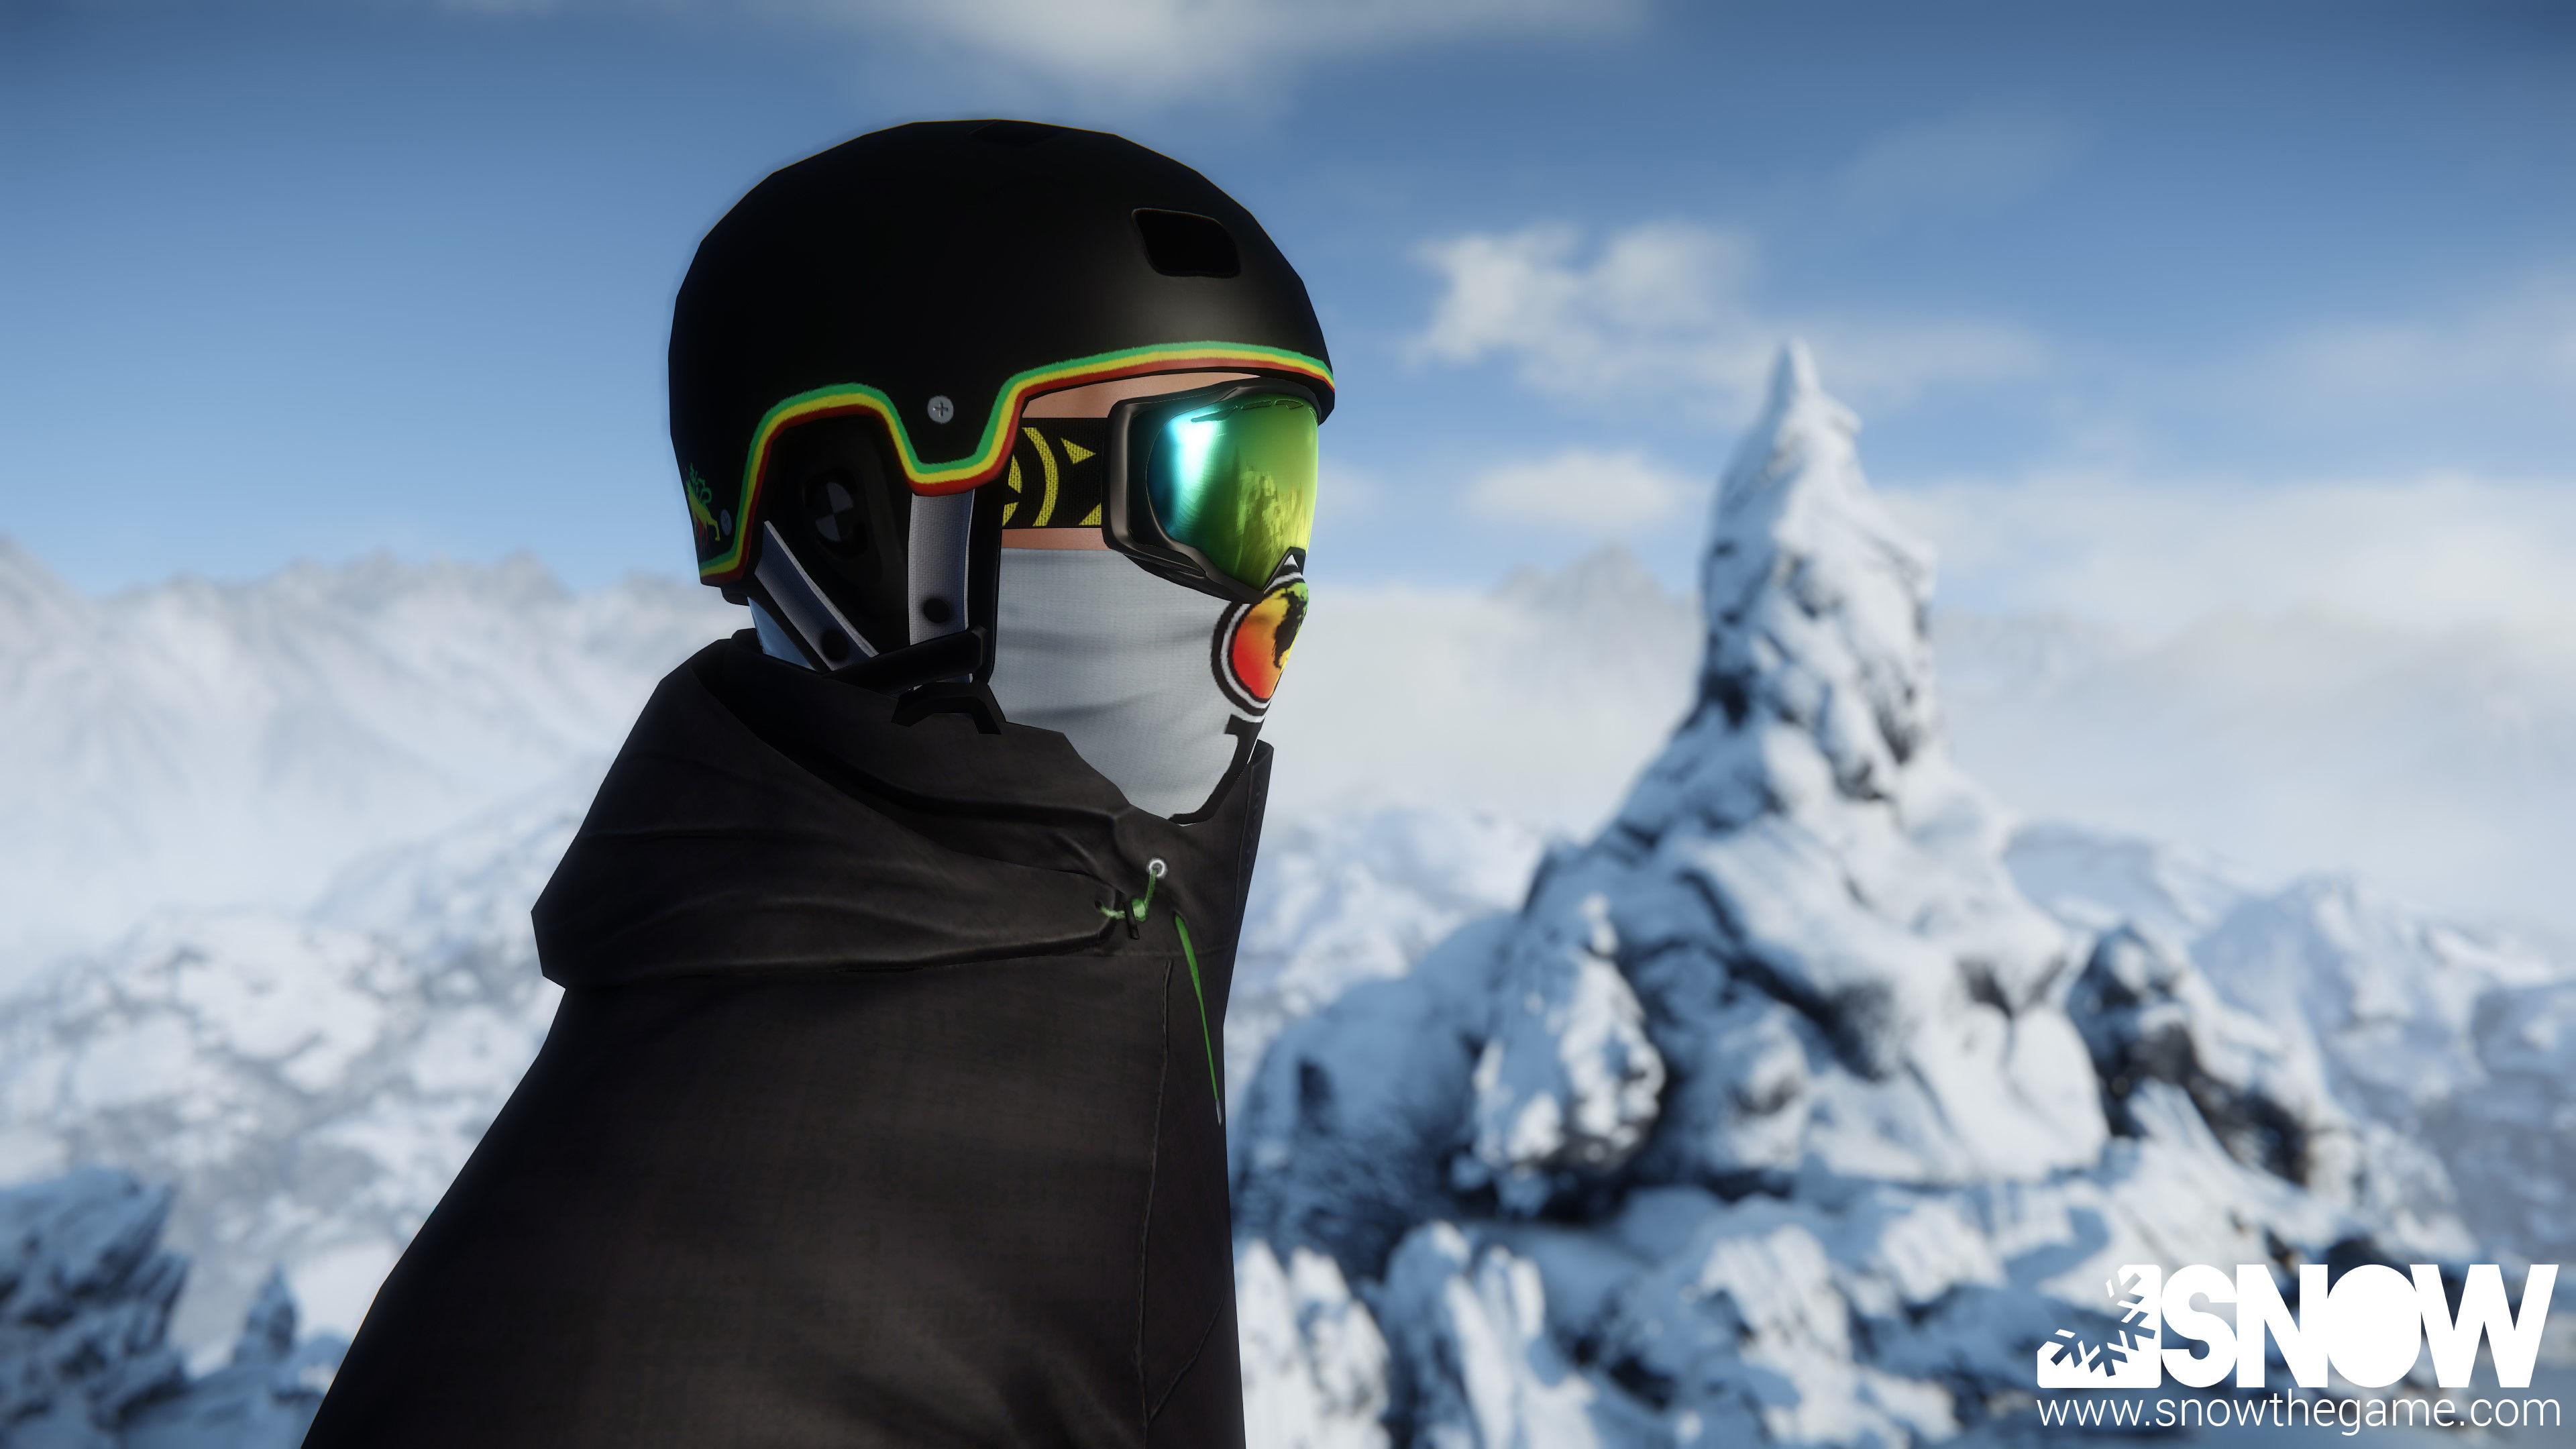 Nové obrázky z adrenalinového SNOW 88118